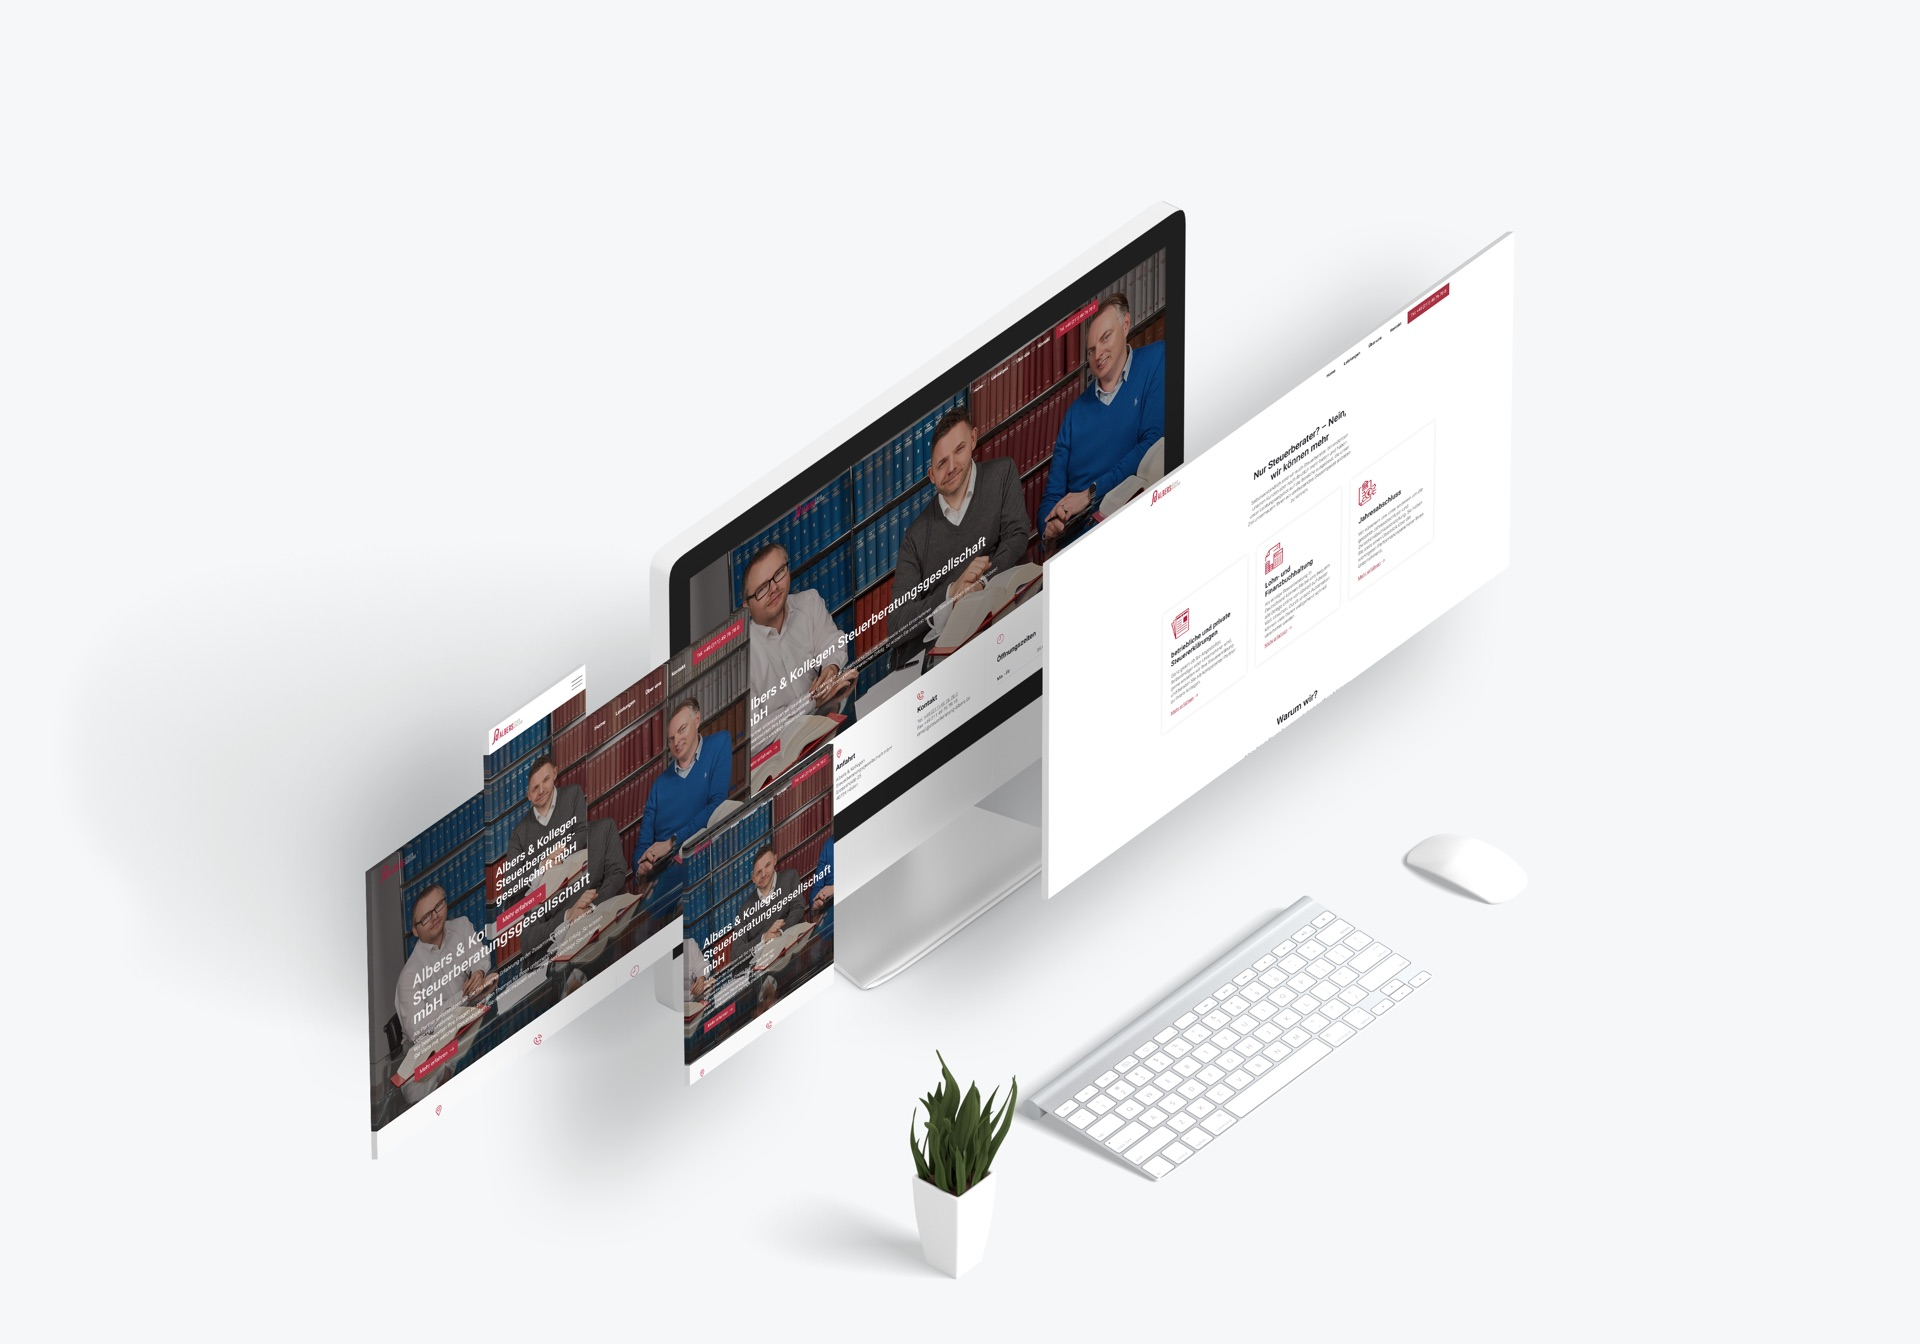 Webdesign Mockup Burkhrad Küpper